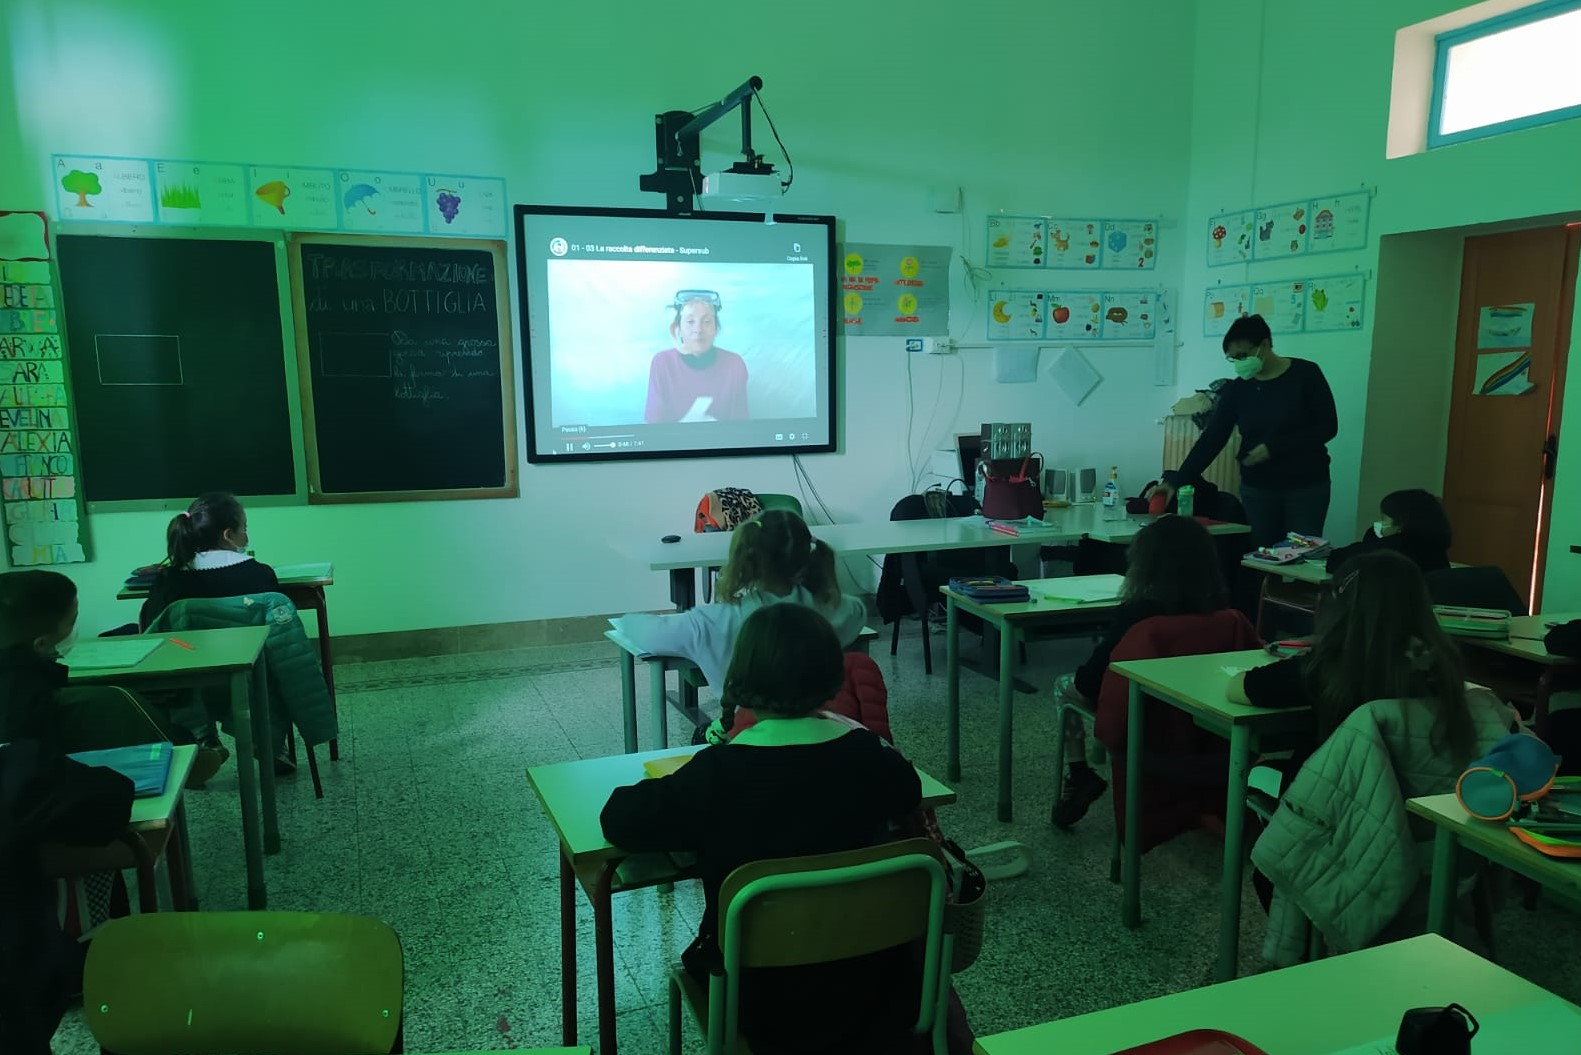 SeiToscana_ricreazione_video_lezione-in-_classe.